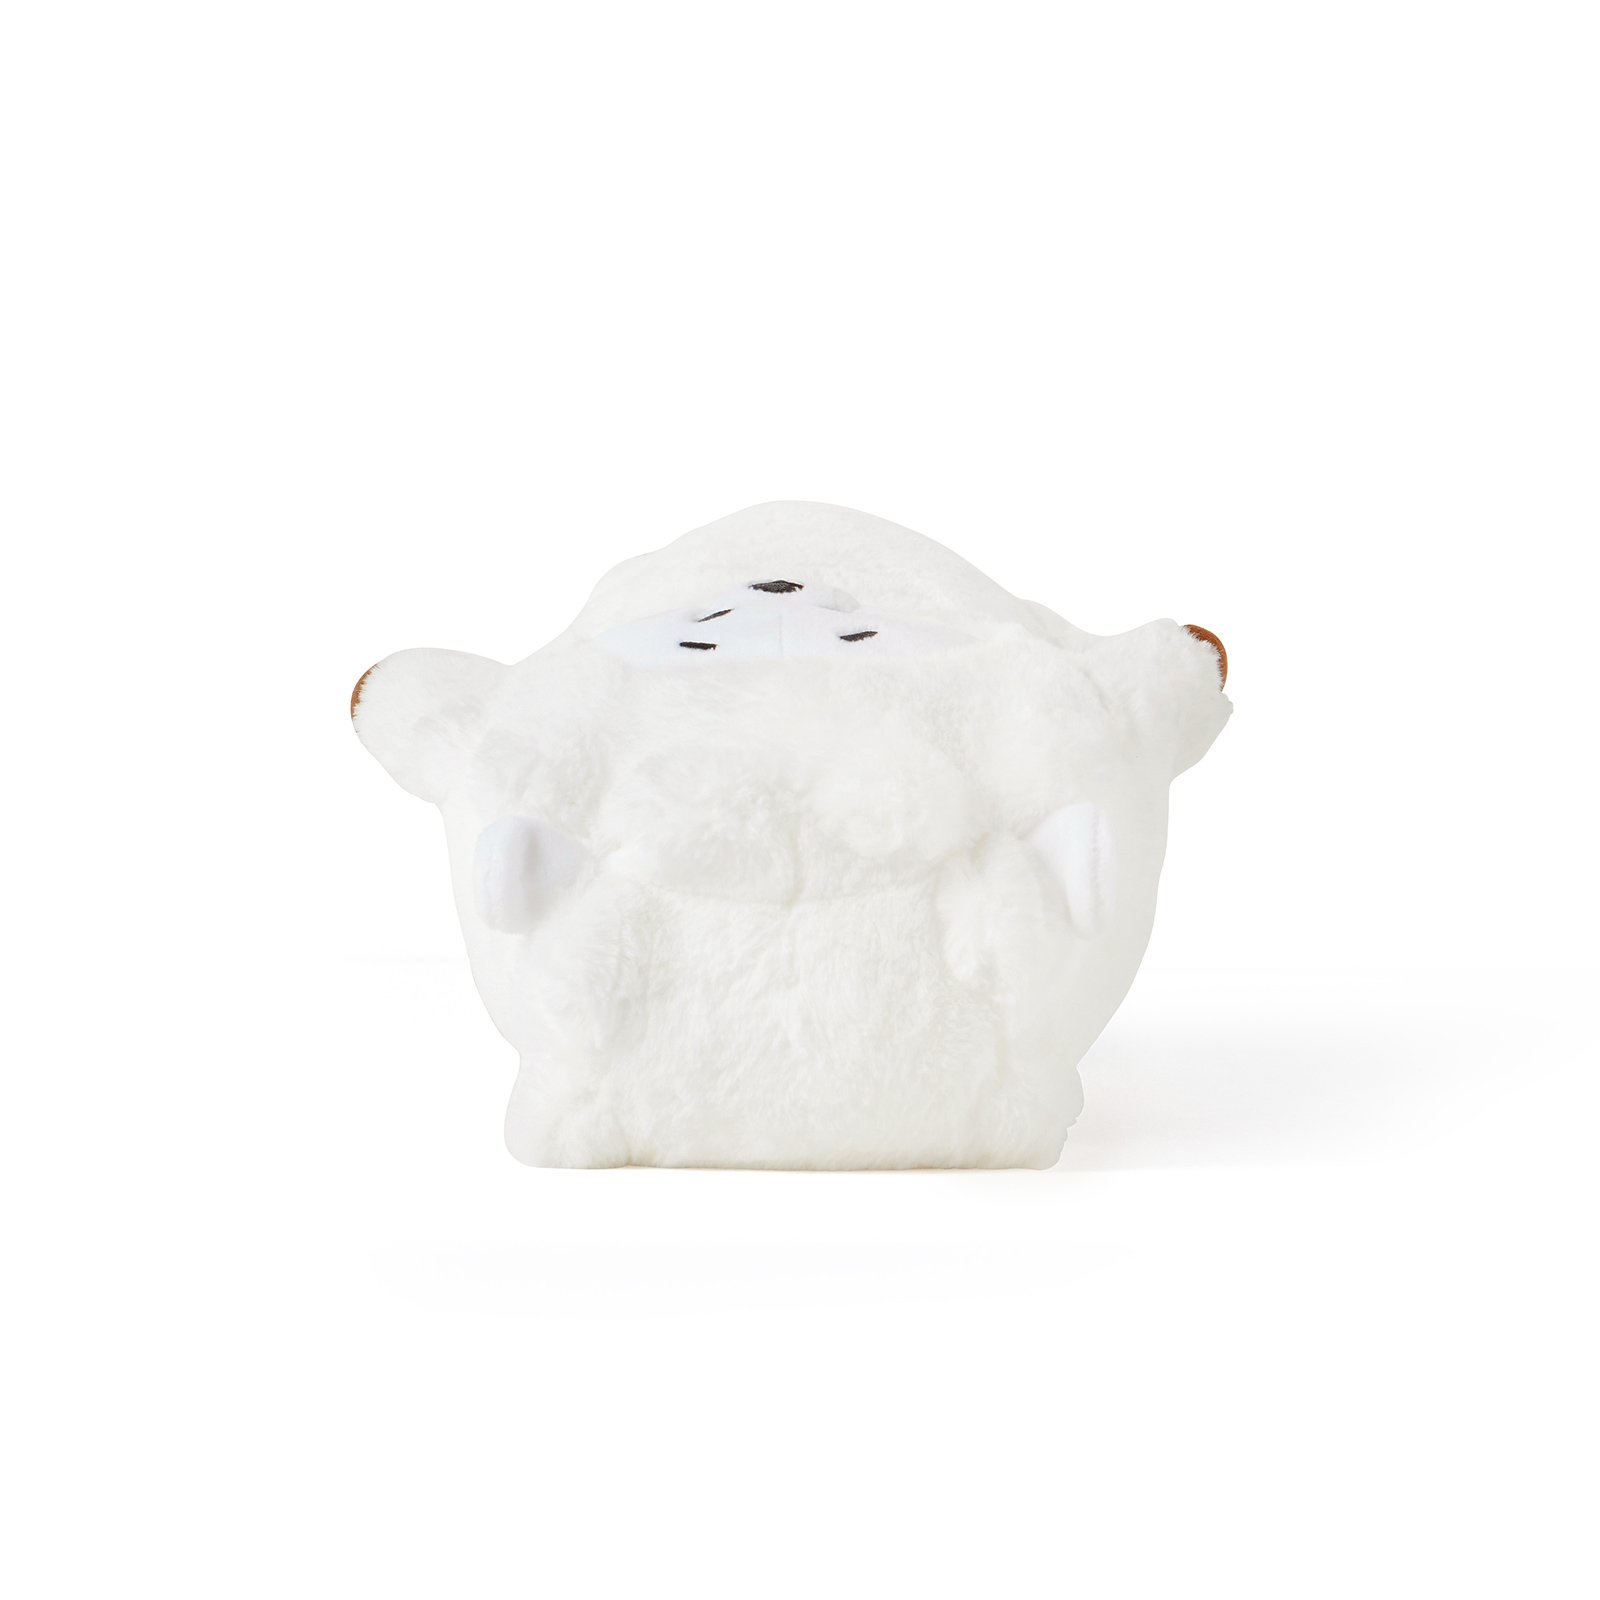 BT21 RJ Standing Plush Doll Medium White by BT21 (Image #5)